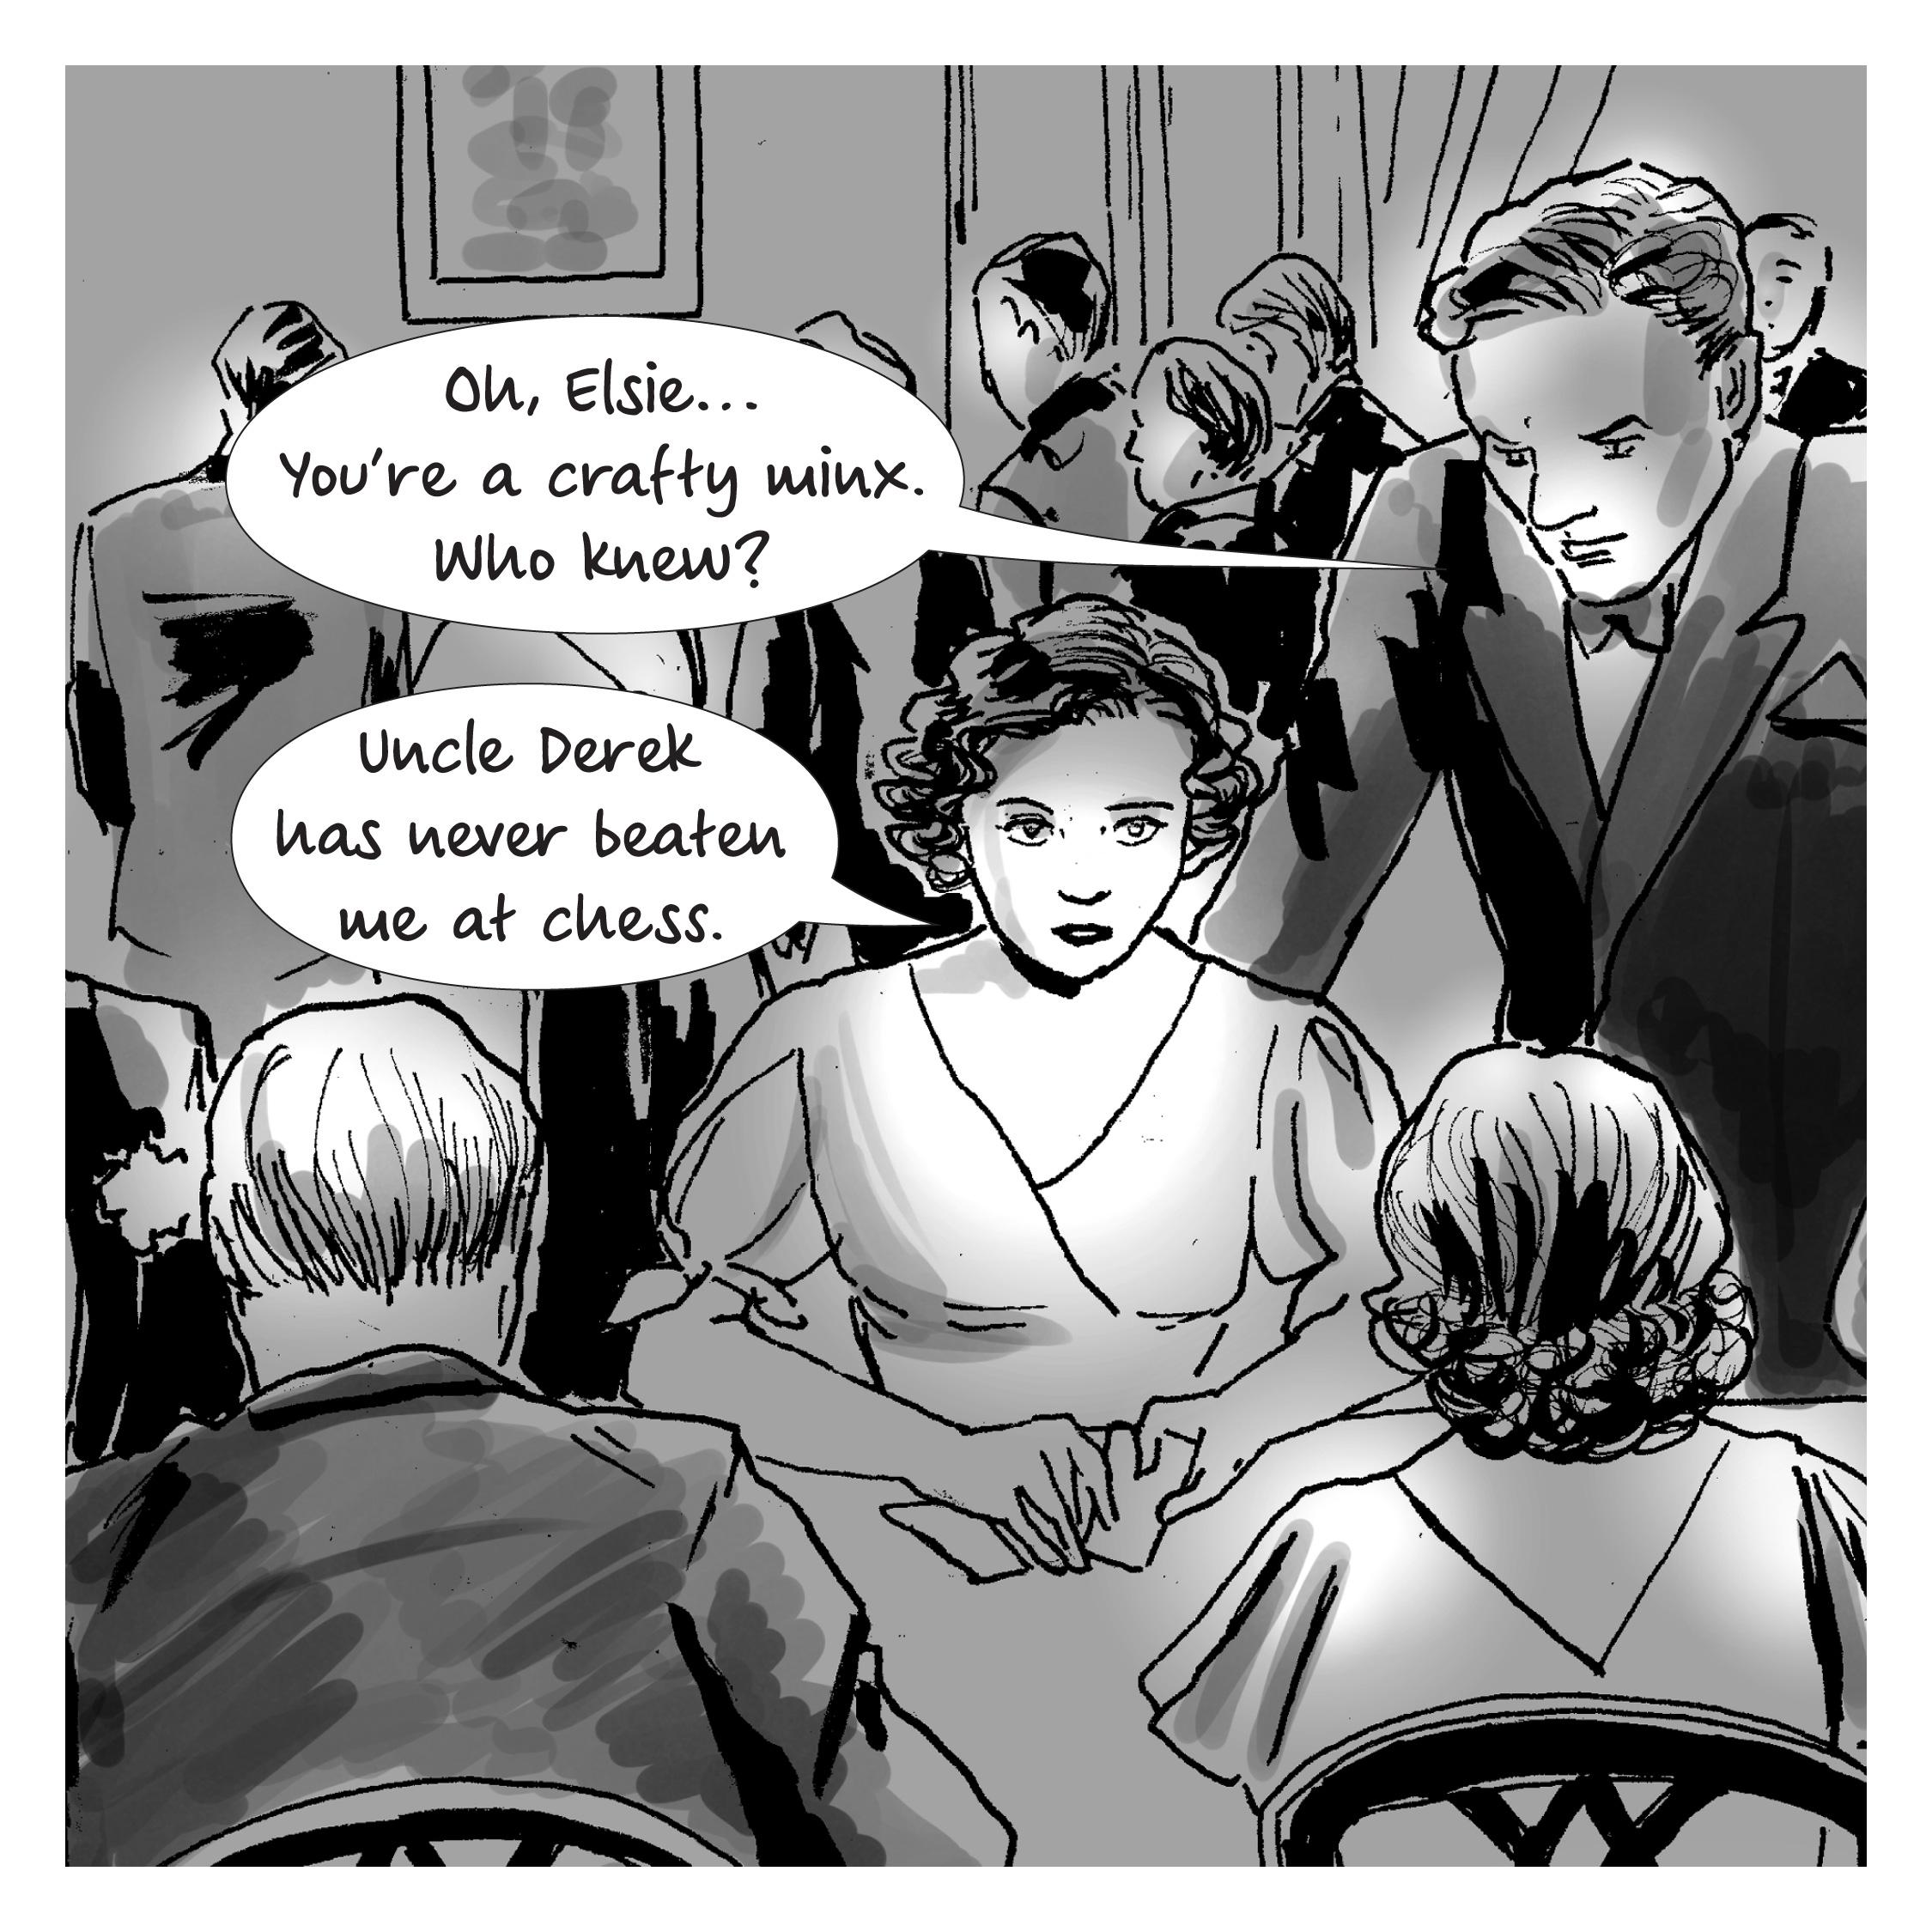 Elsie 3 panels-03.jpg